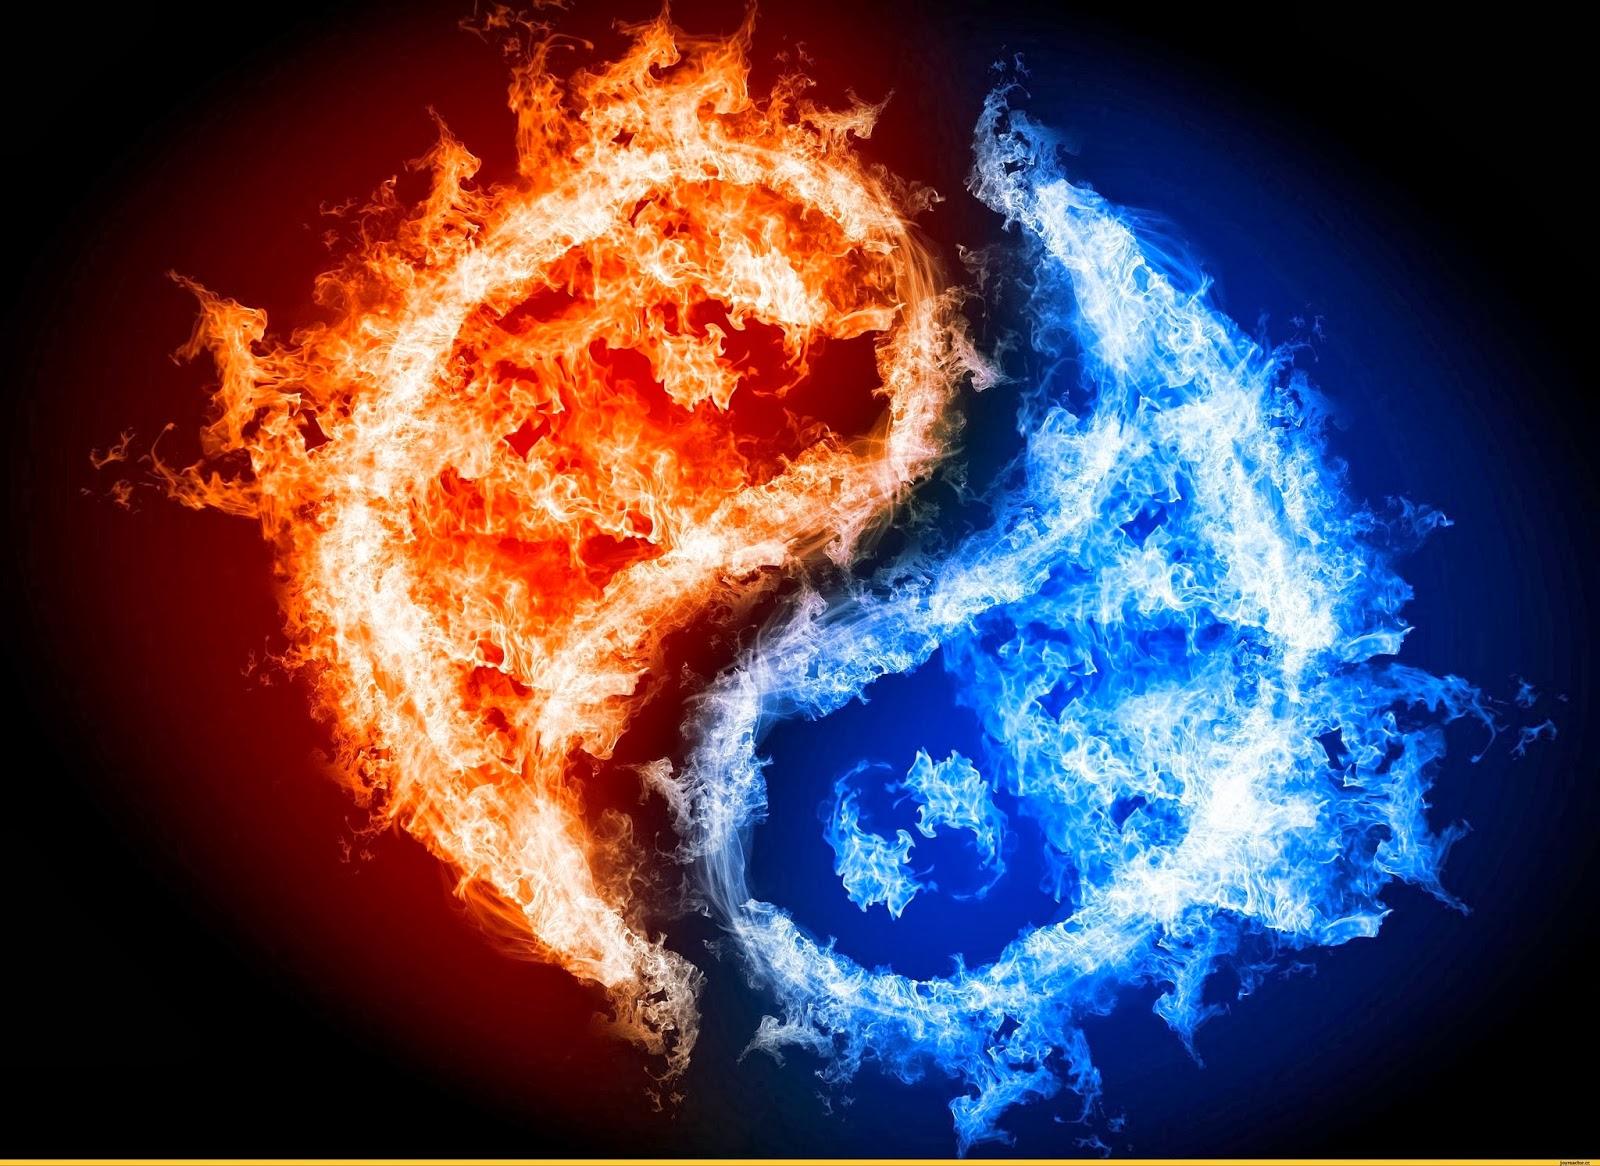 Fire Wallpapers Desktop